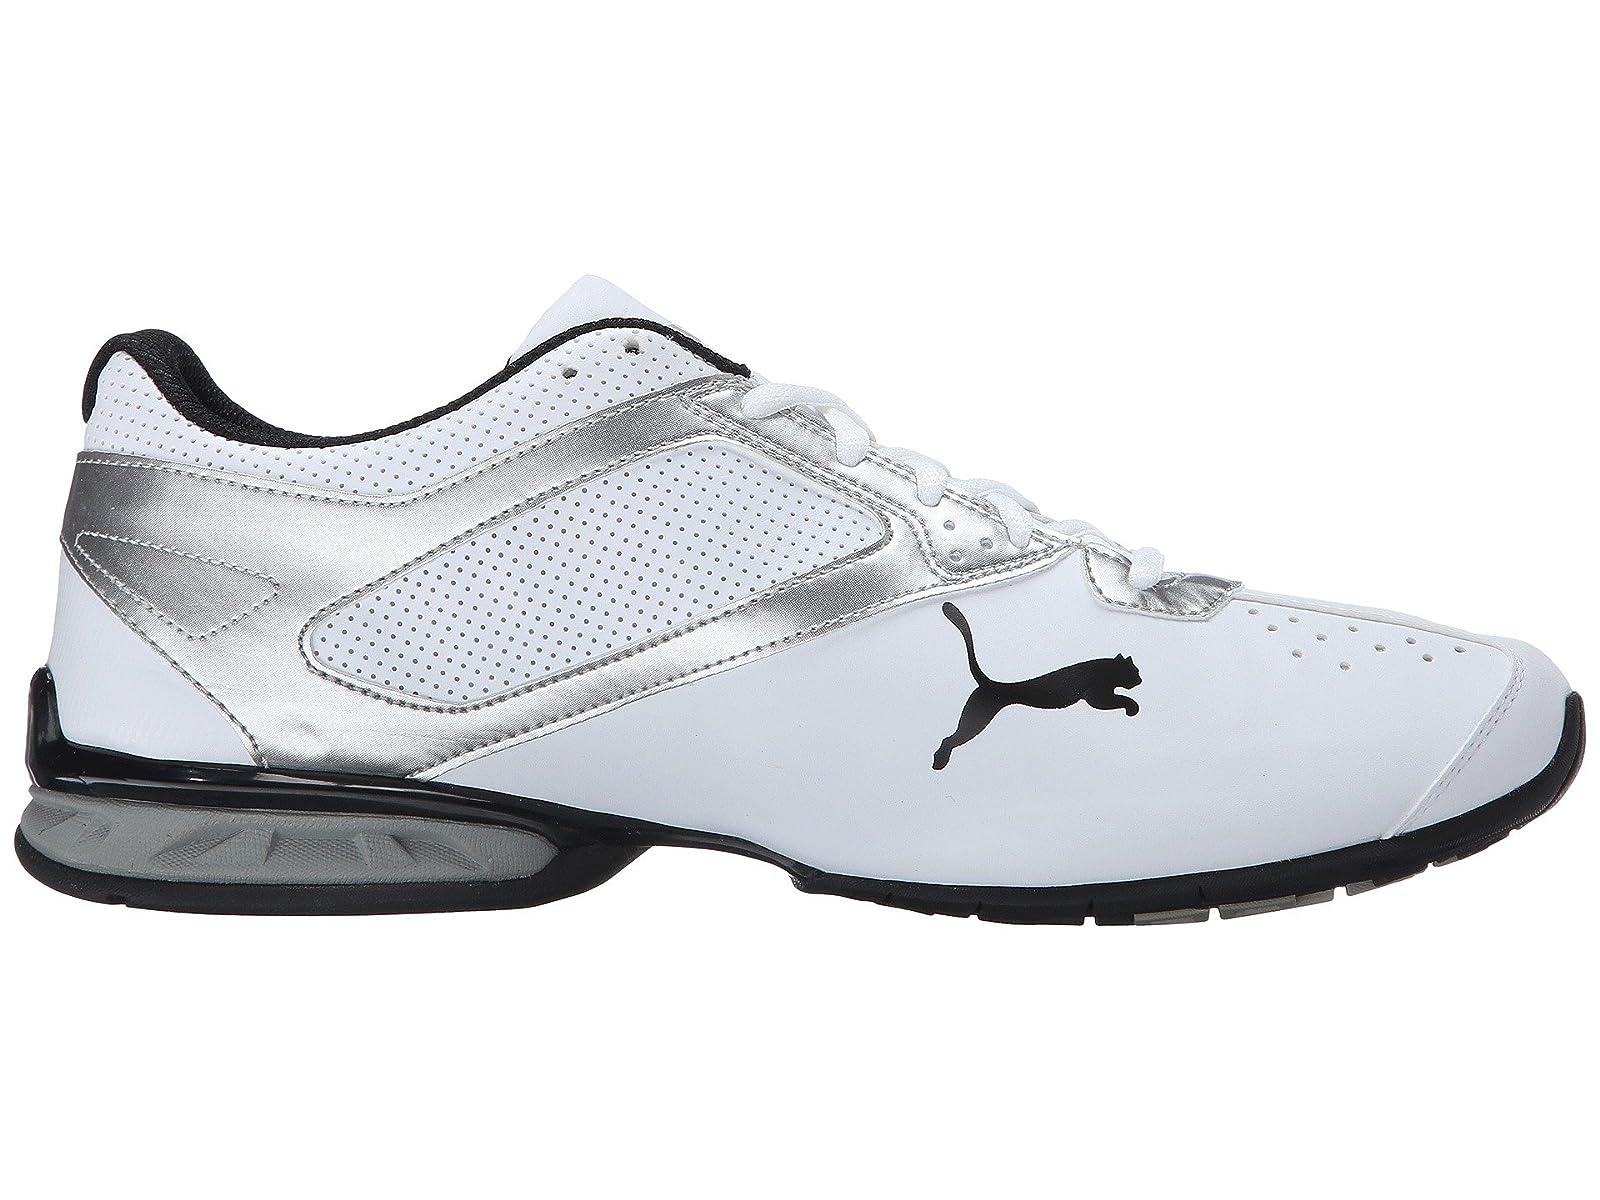 Men-039-s-Scarpe-Da-Ginnastica-amp-Athletic-Shoes-Puma-Tazon-6-FM miniatura 28